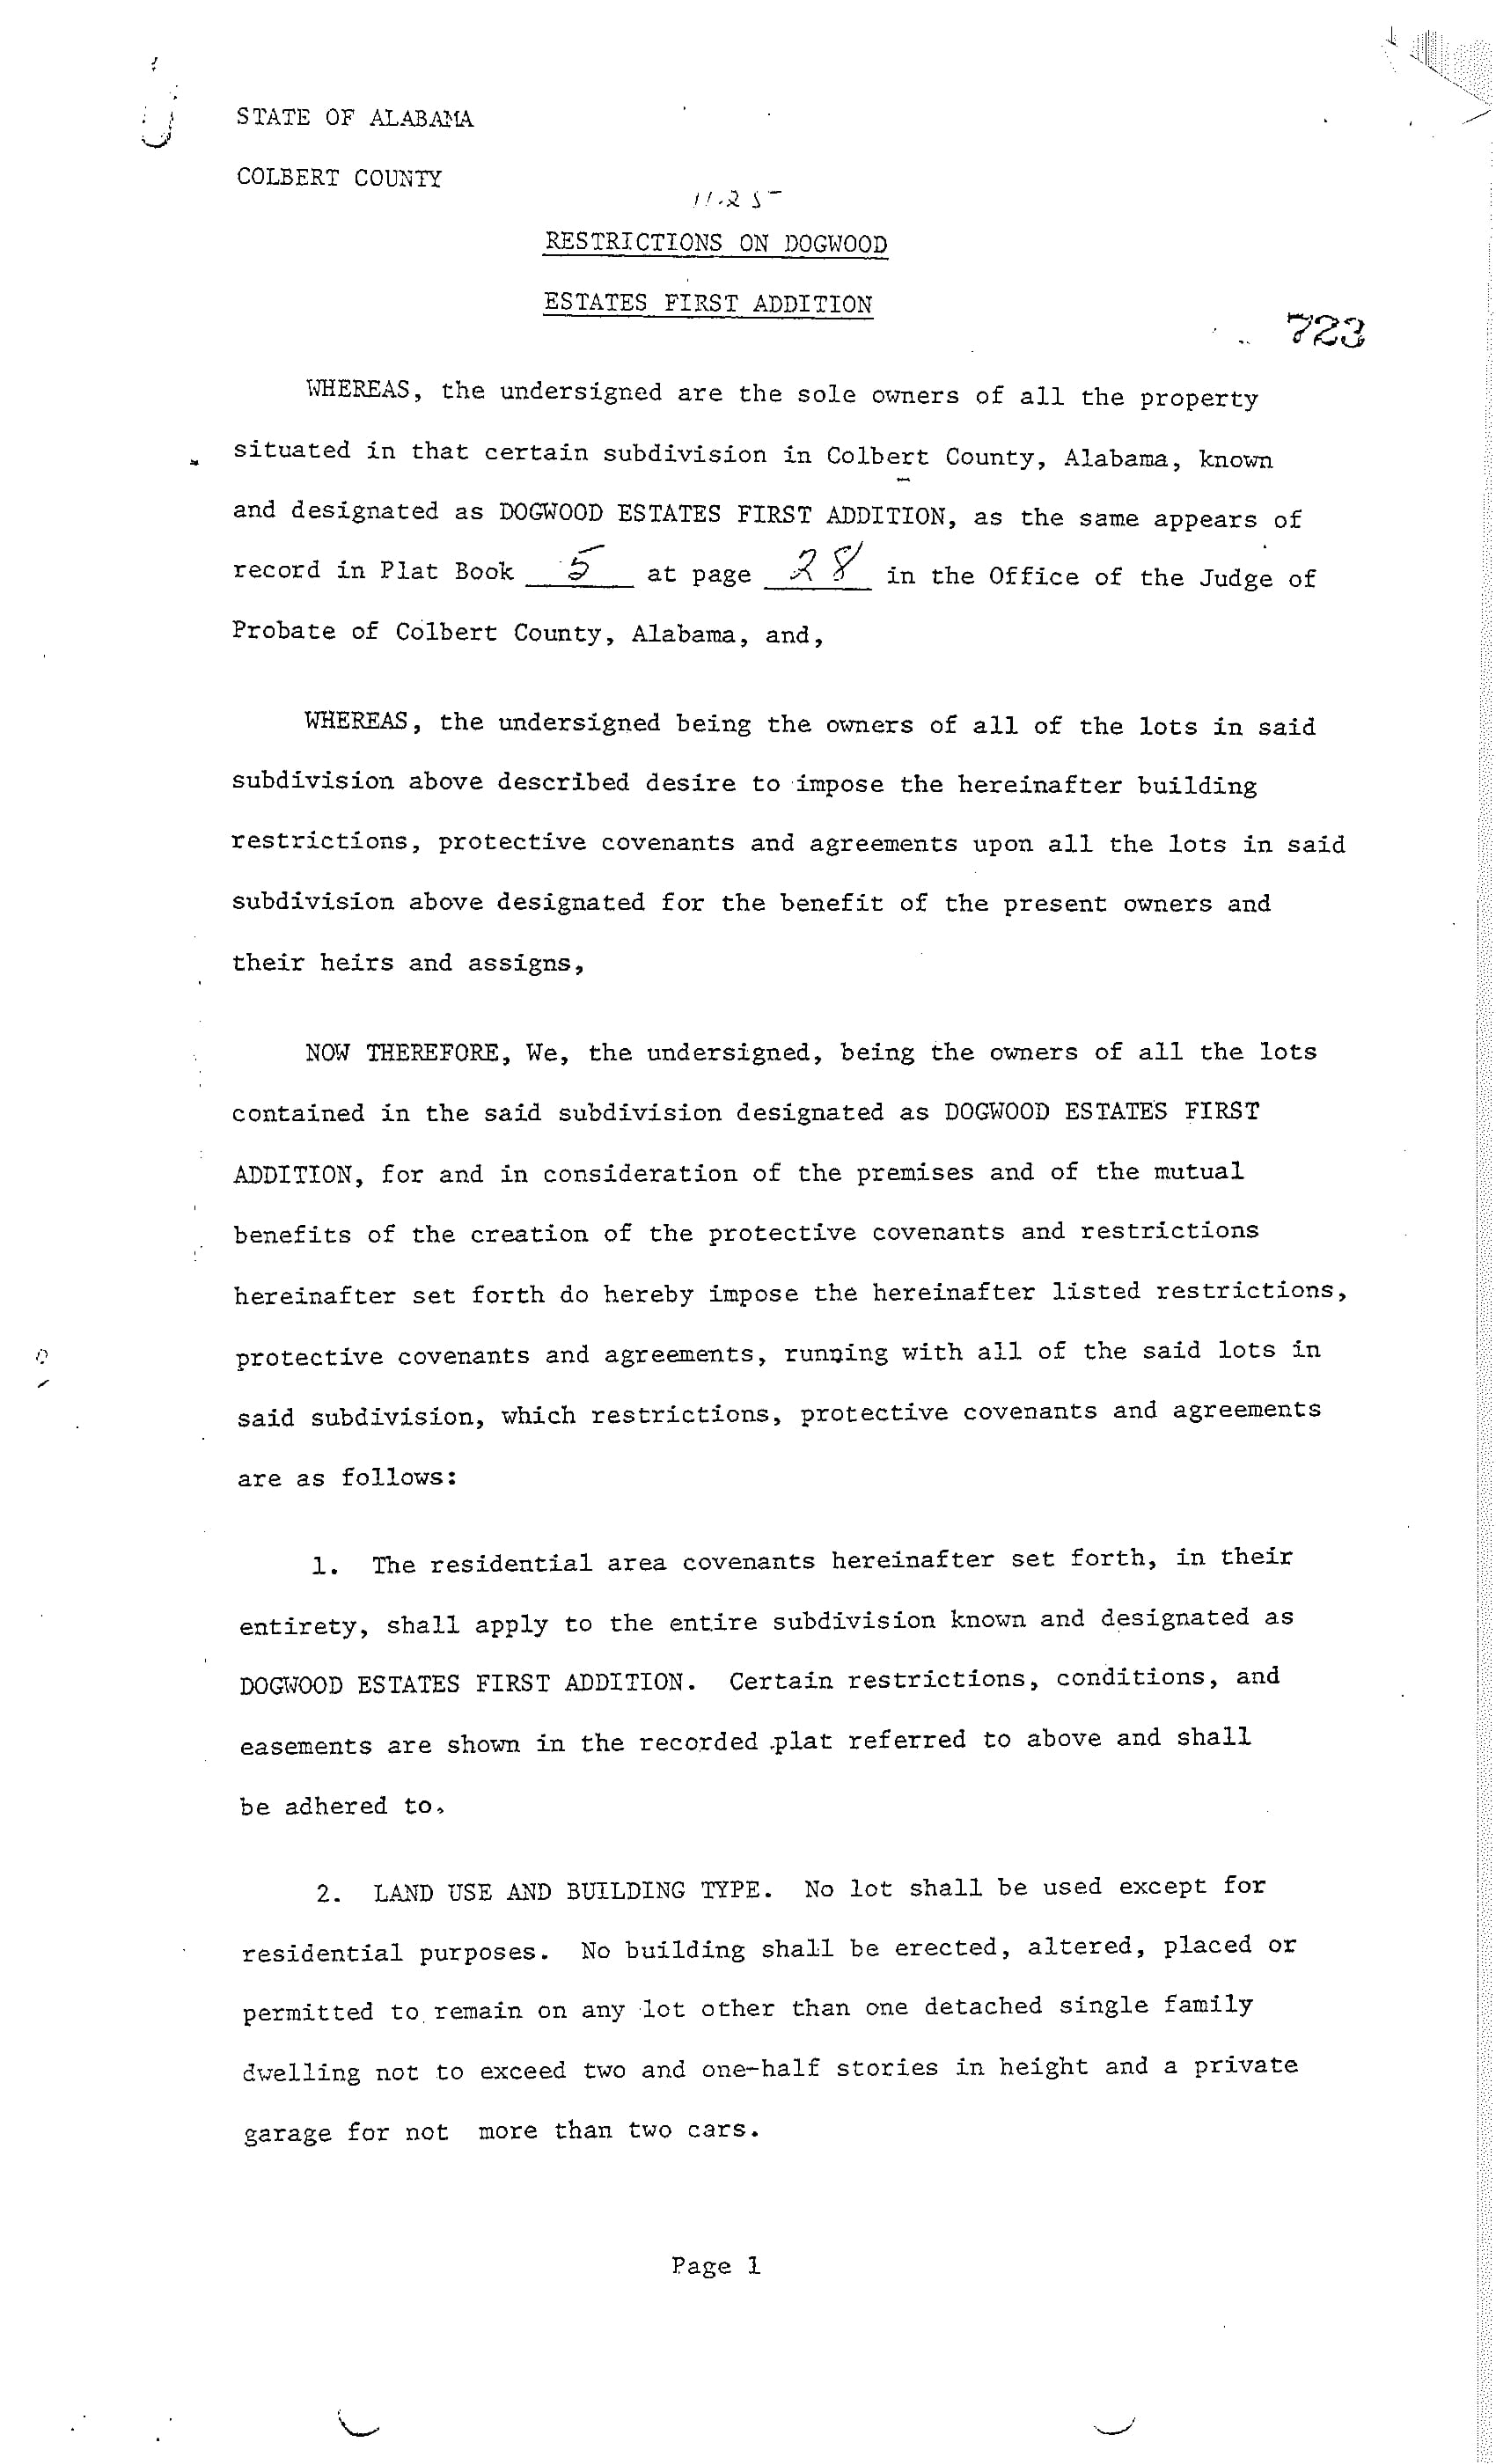 Covenants-Dogwood-Estates-Addition-1-1.jpg